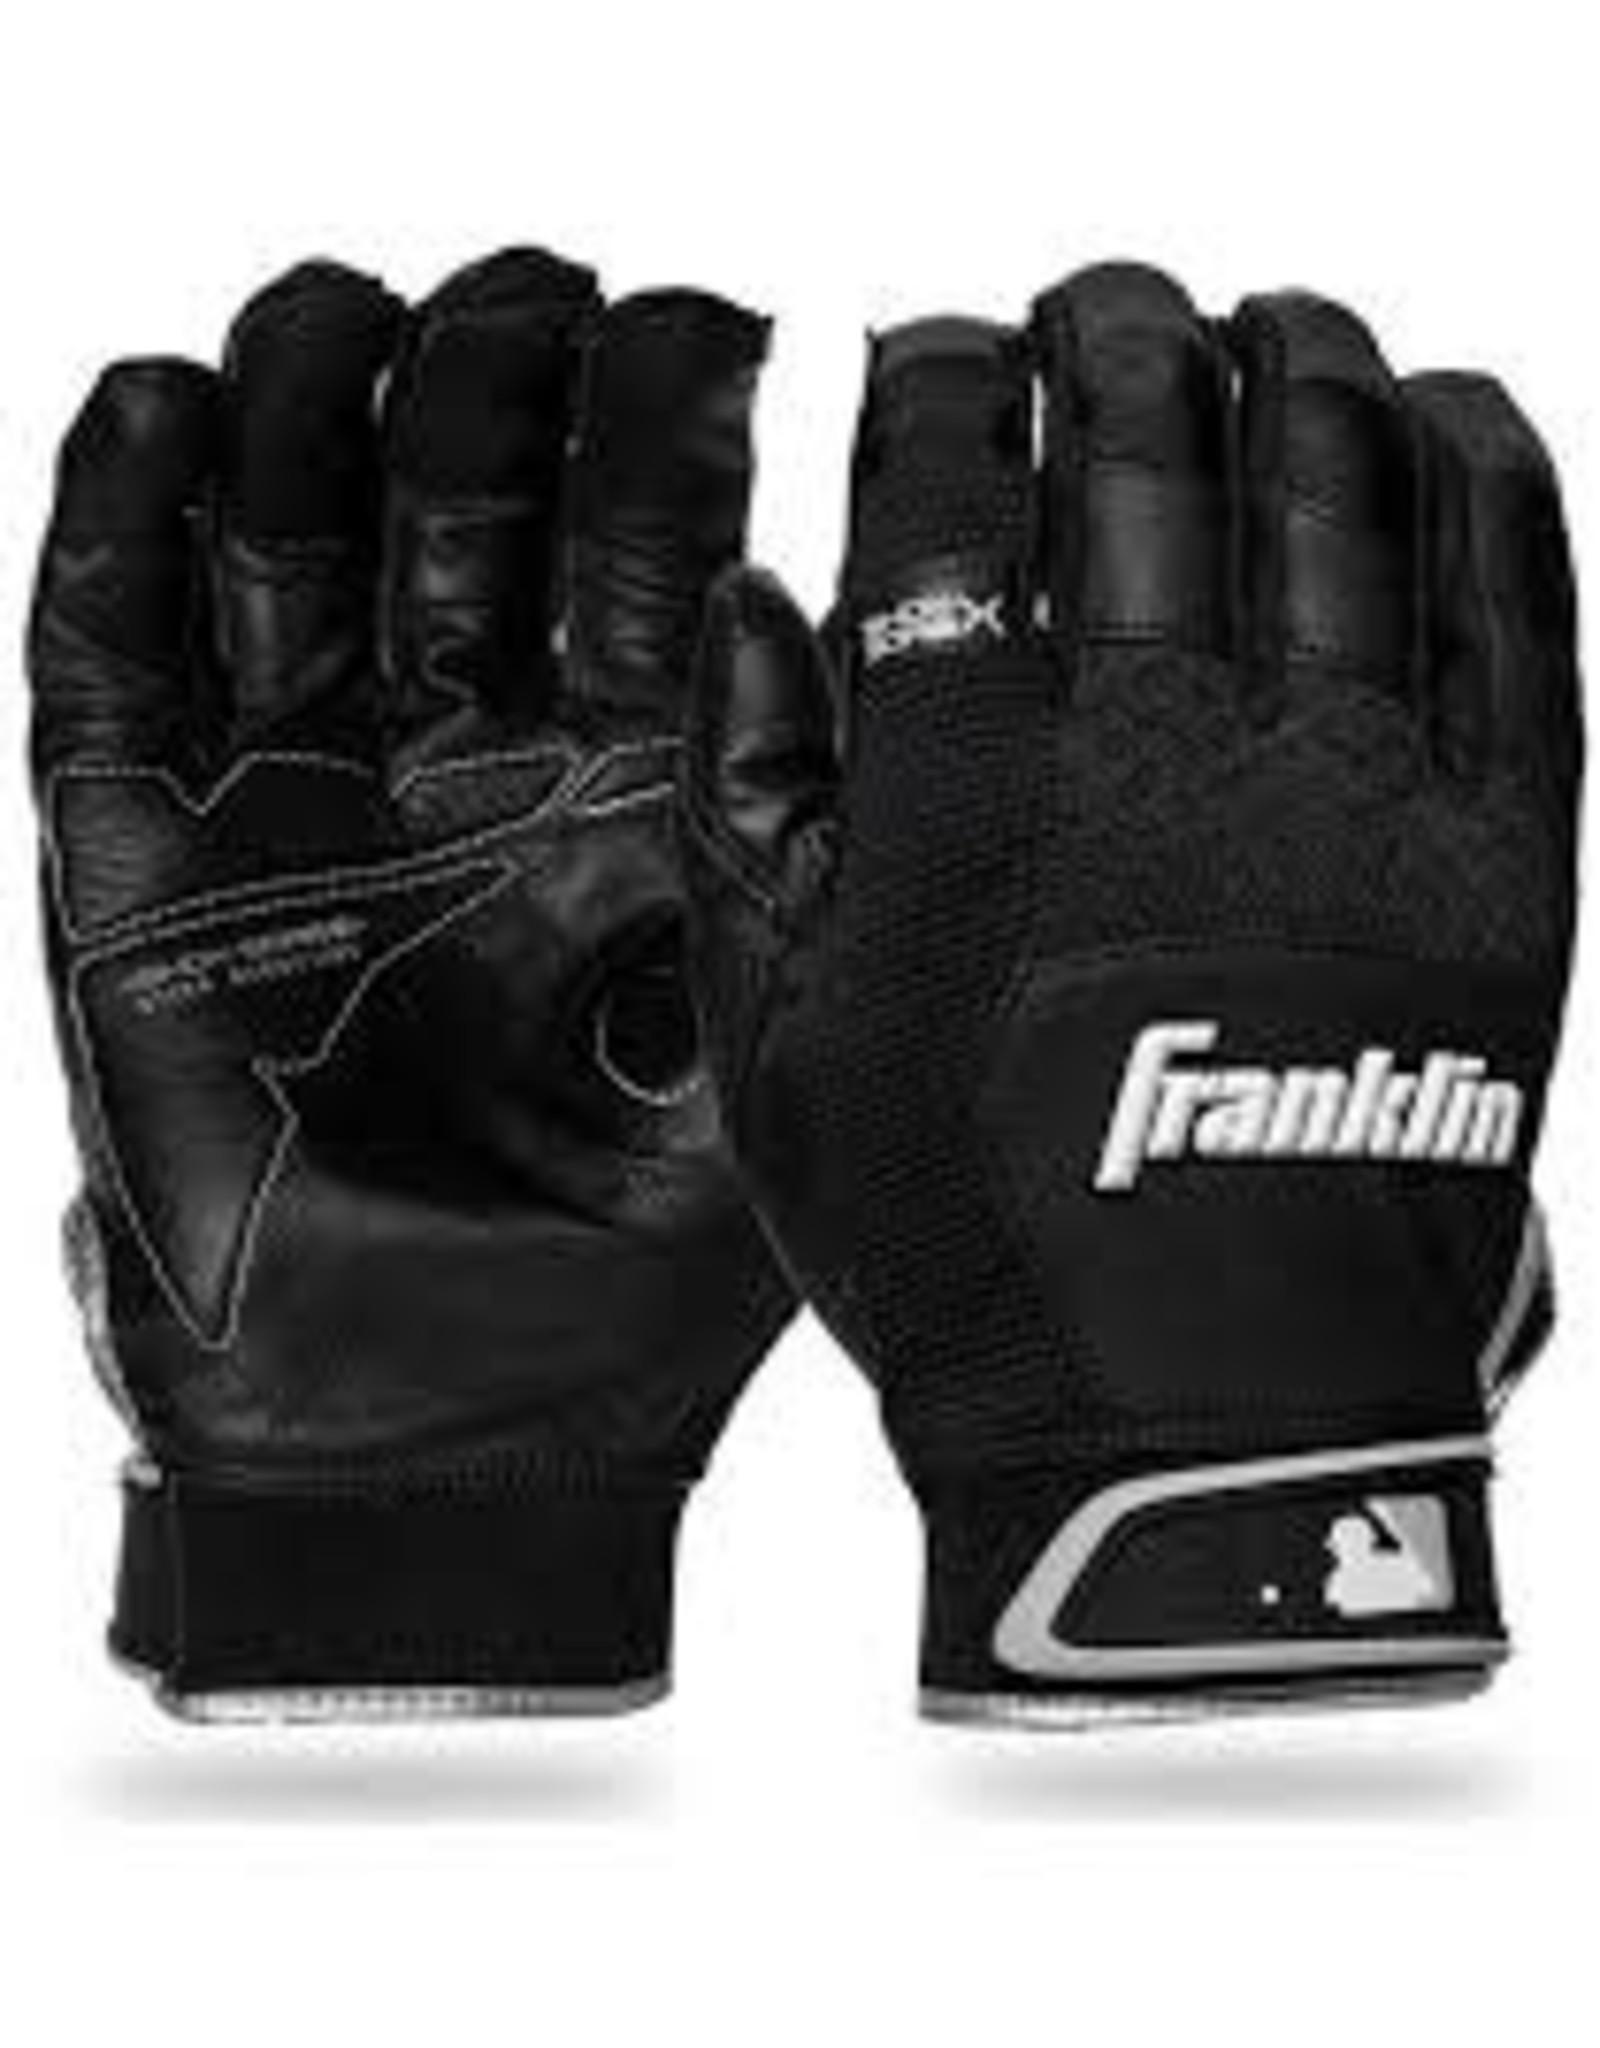 Franklin - Shok-Sorb X Noir Adulte